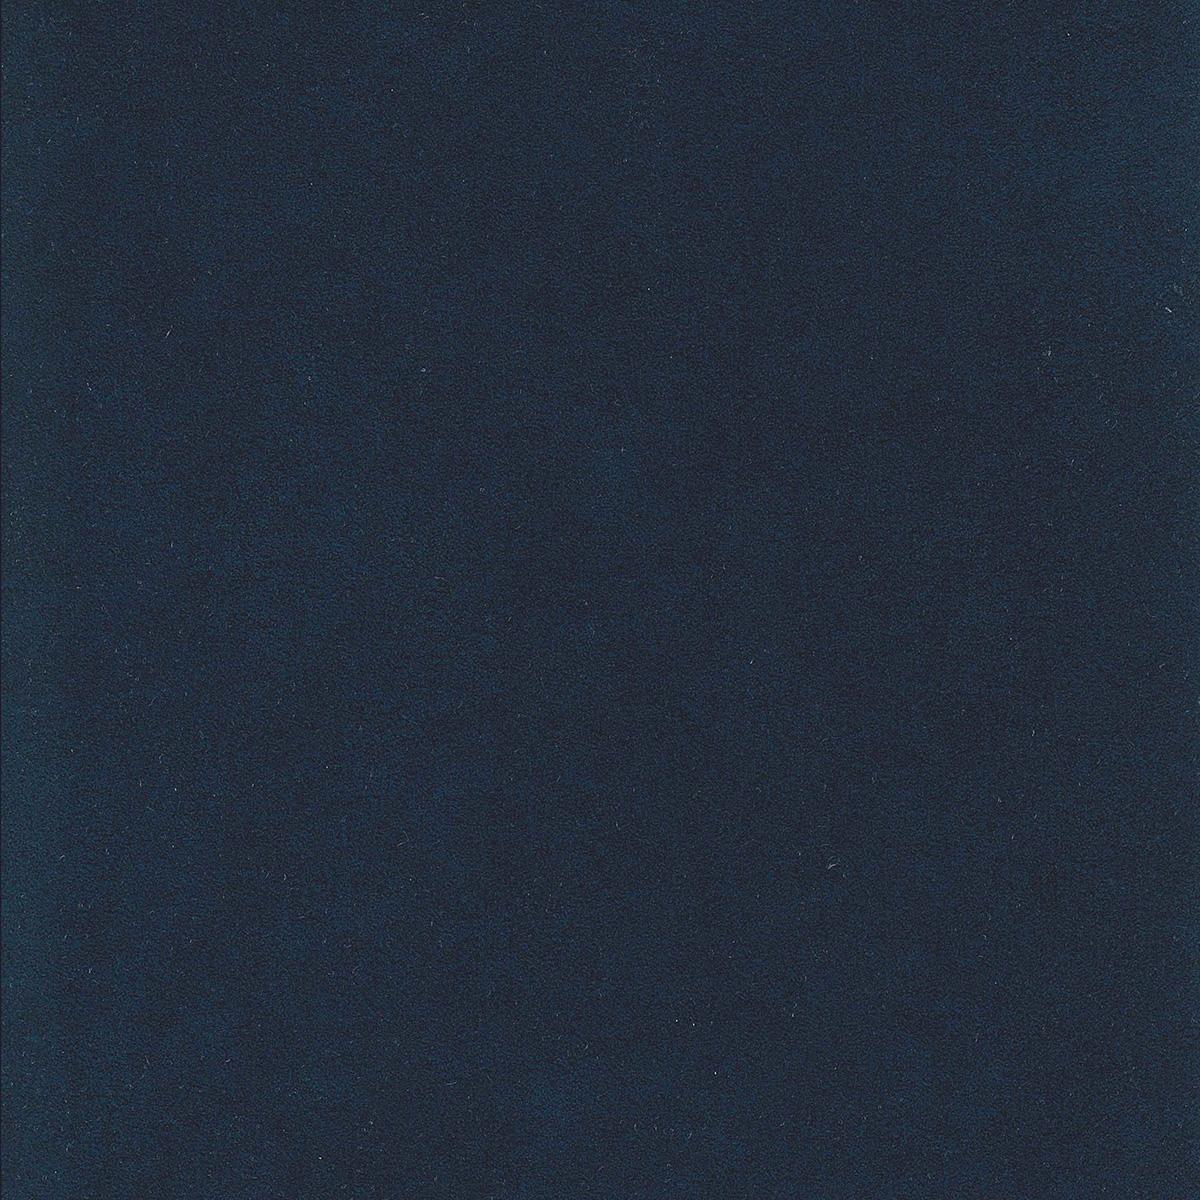 791 Blu Navy